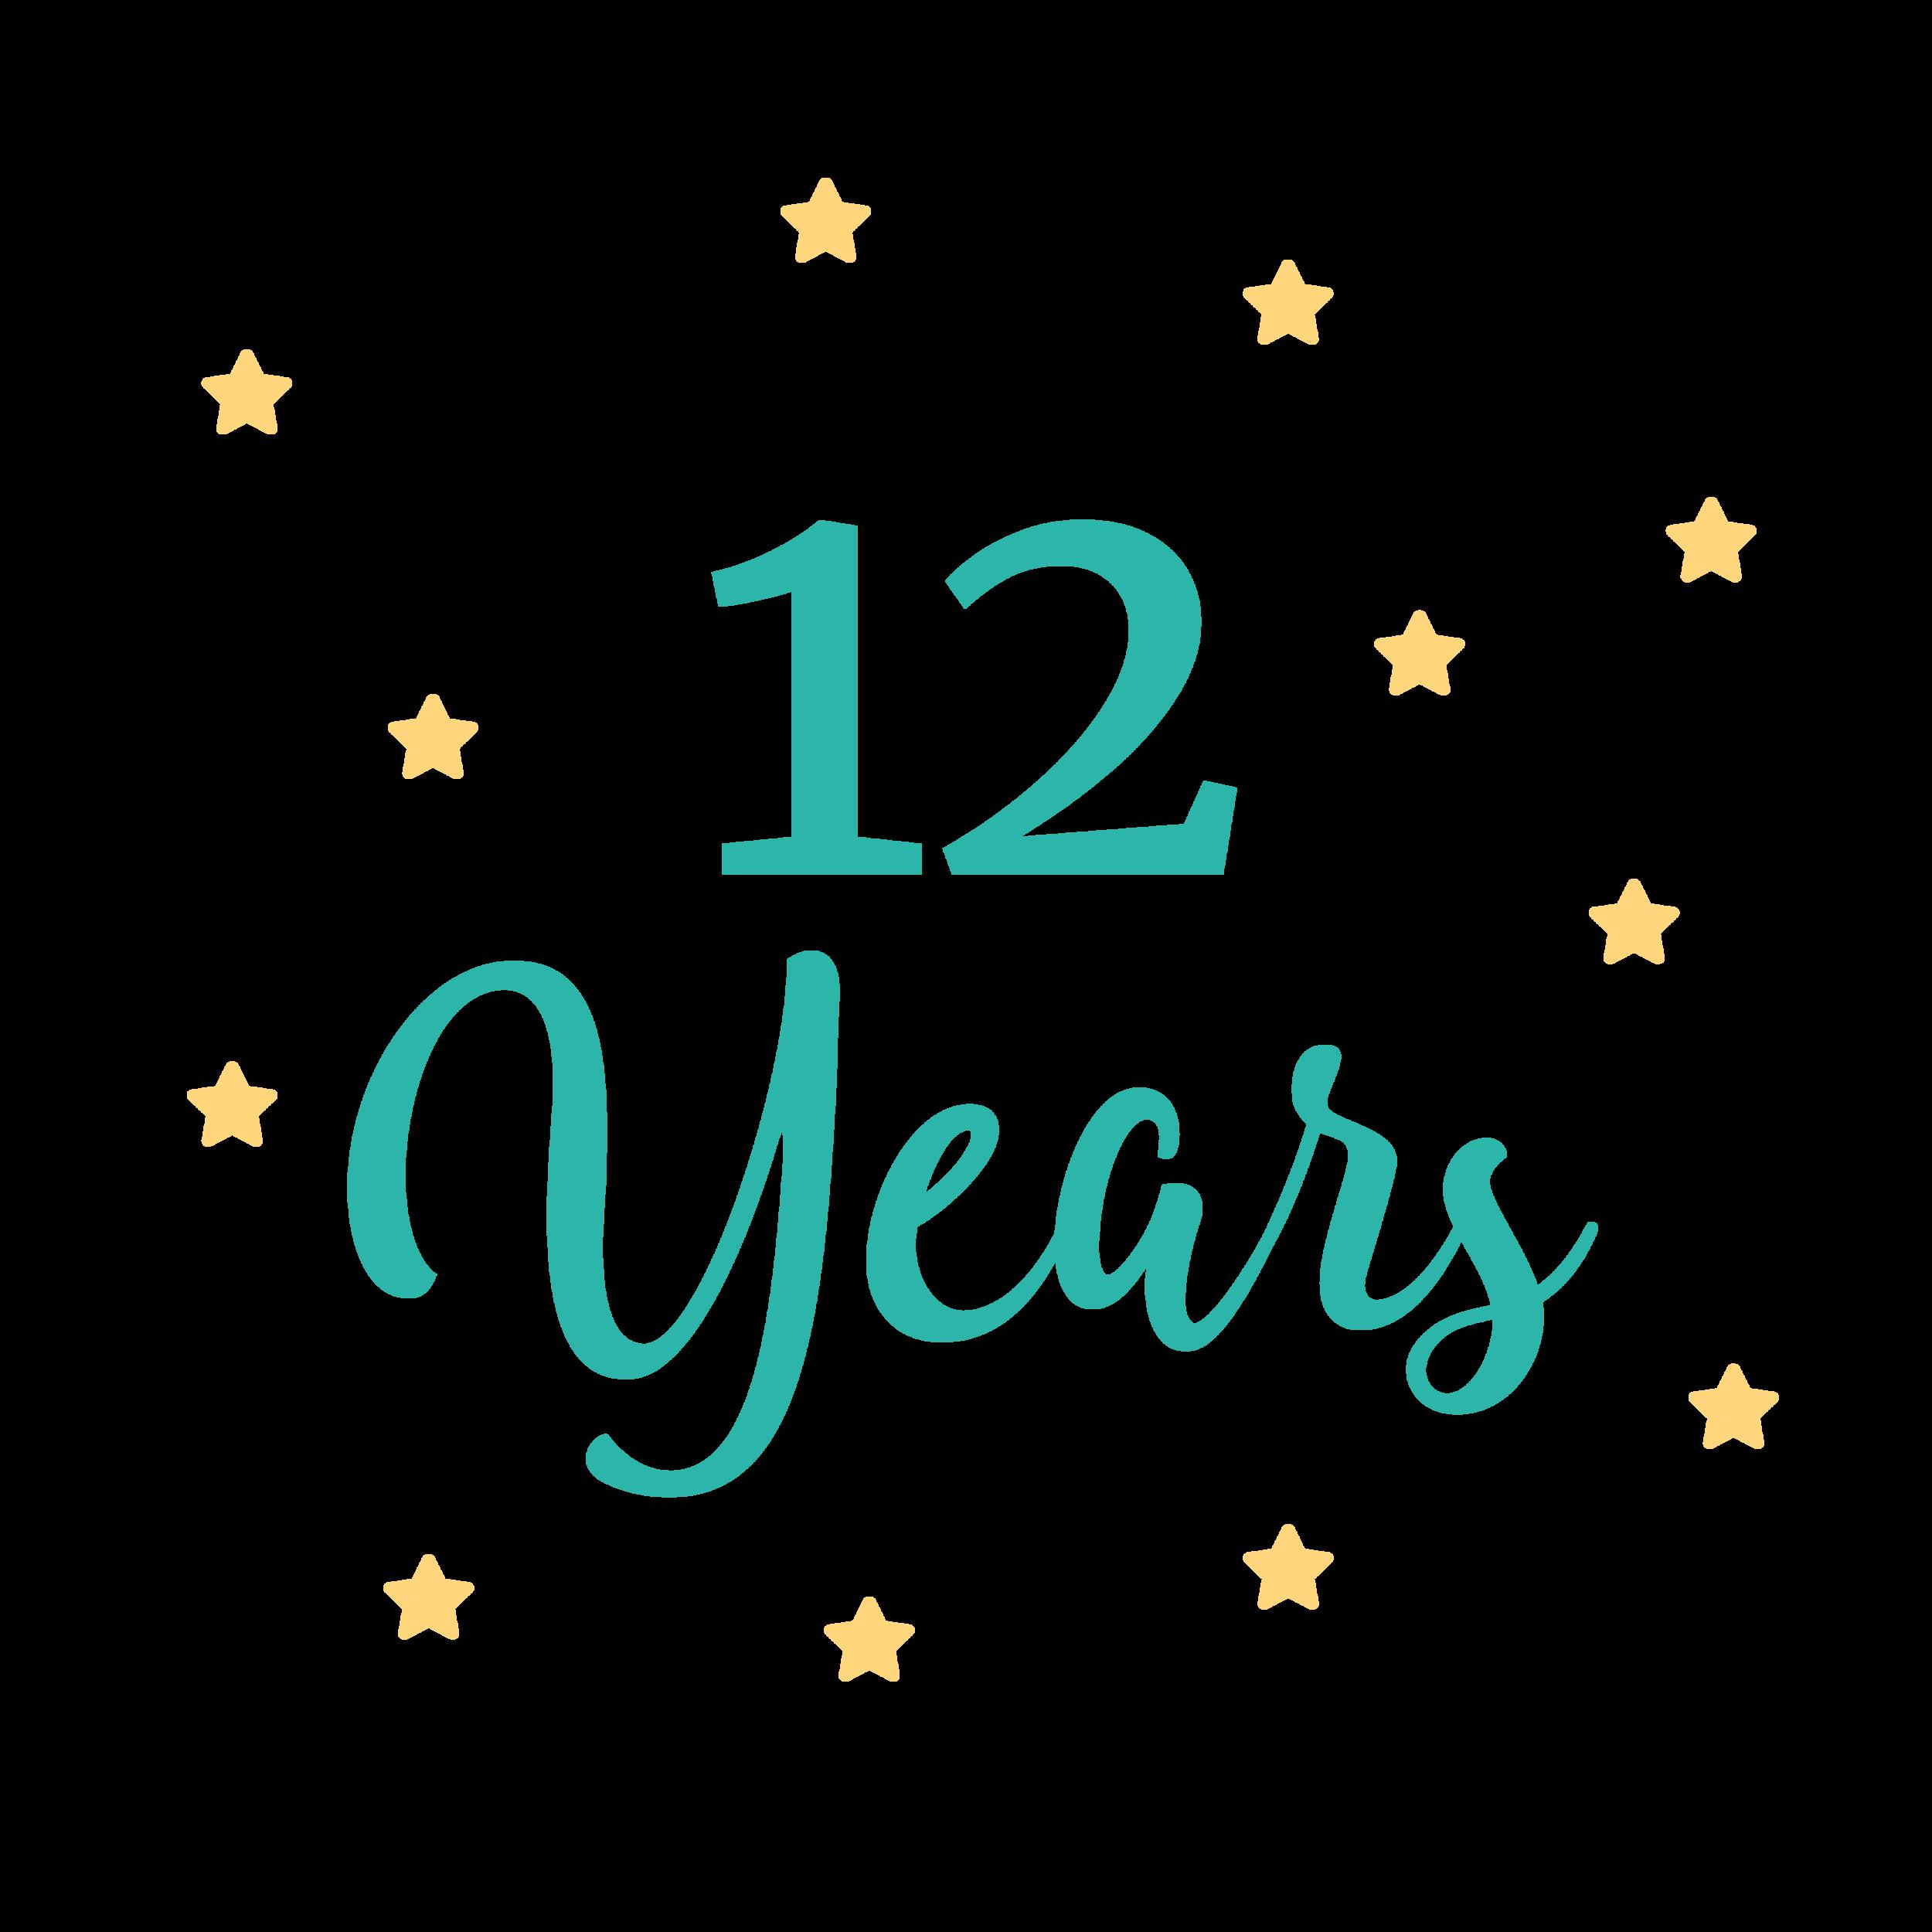 12 Year Visit - Adolescent Questionnaire (form)